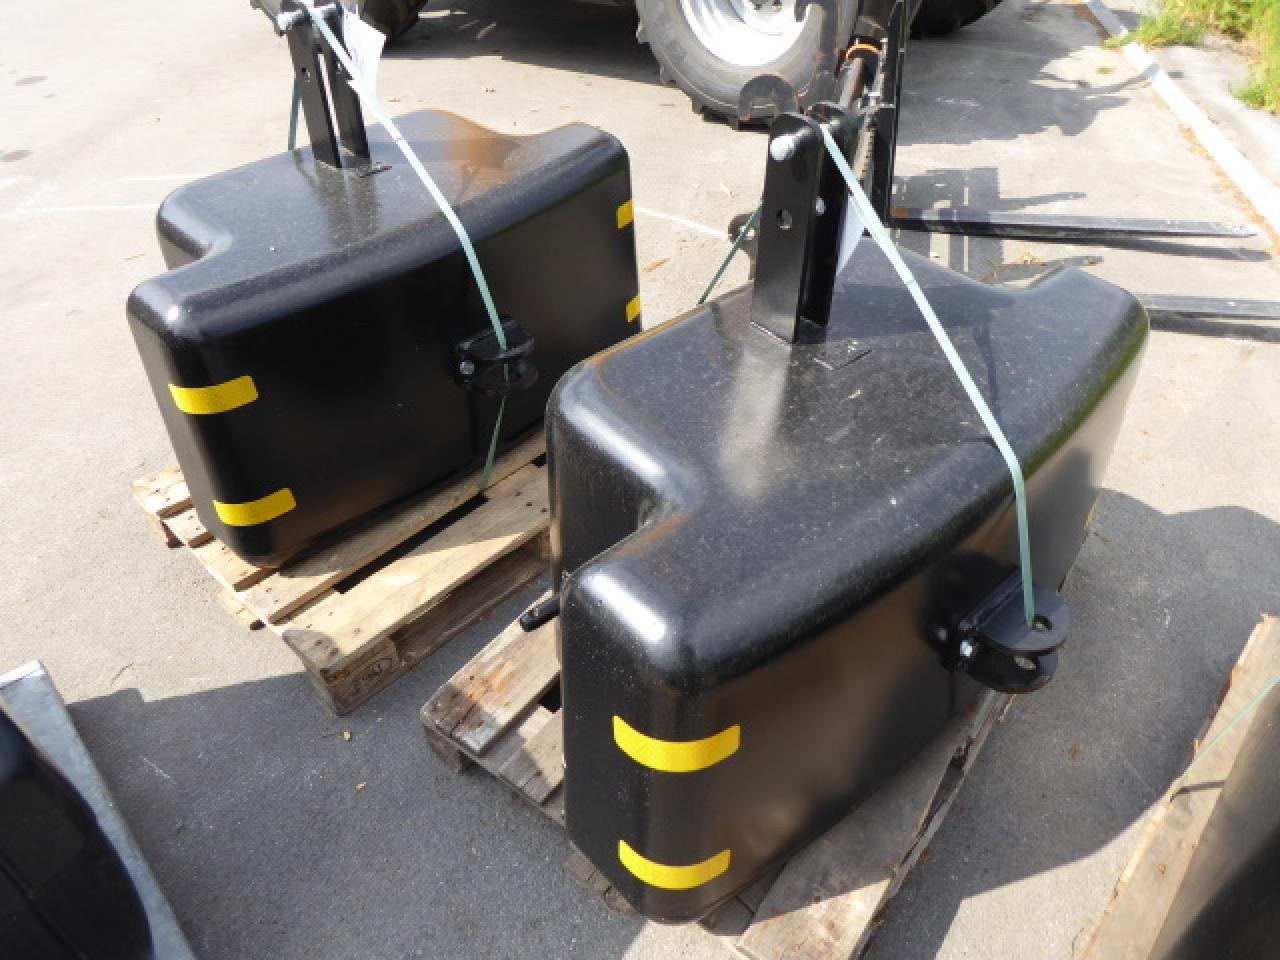 Deutz-Fahr ECO-Top 750 kg